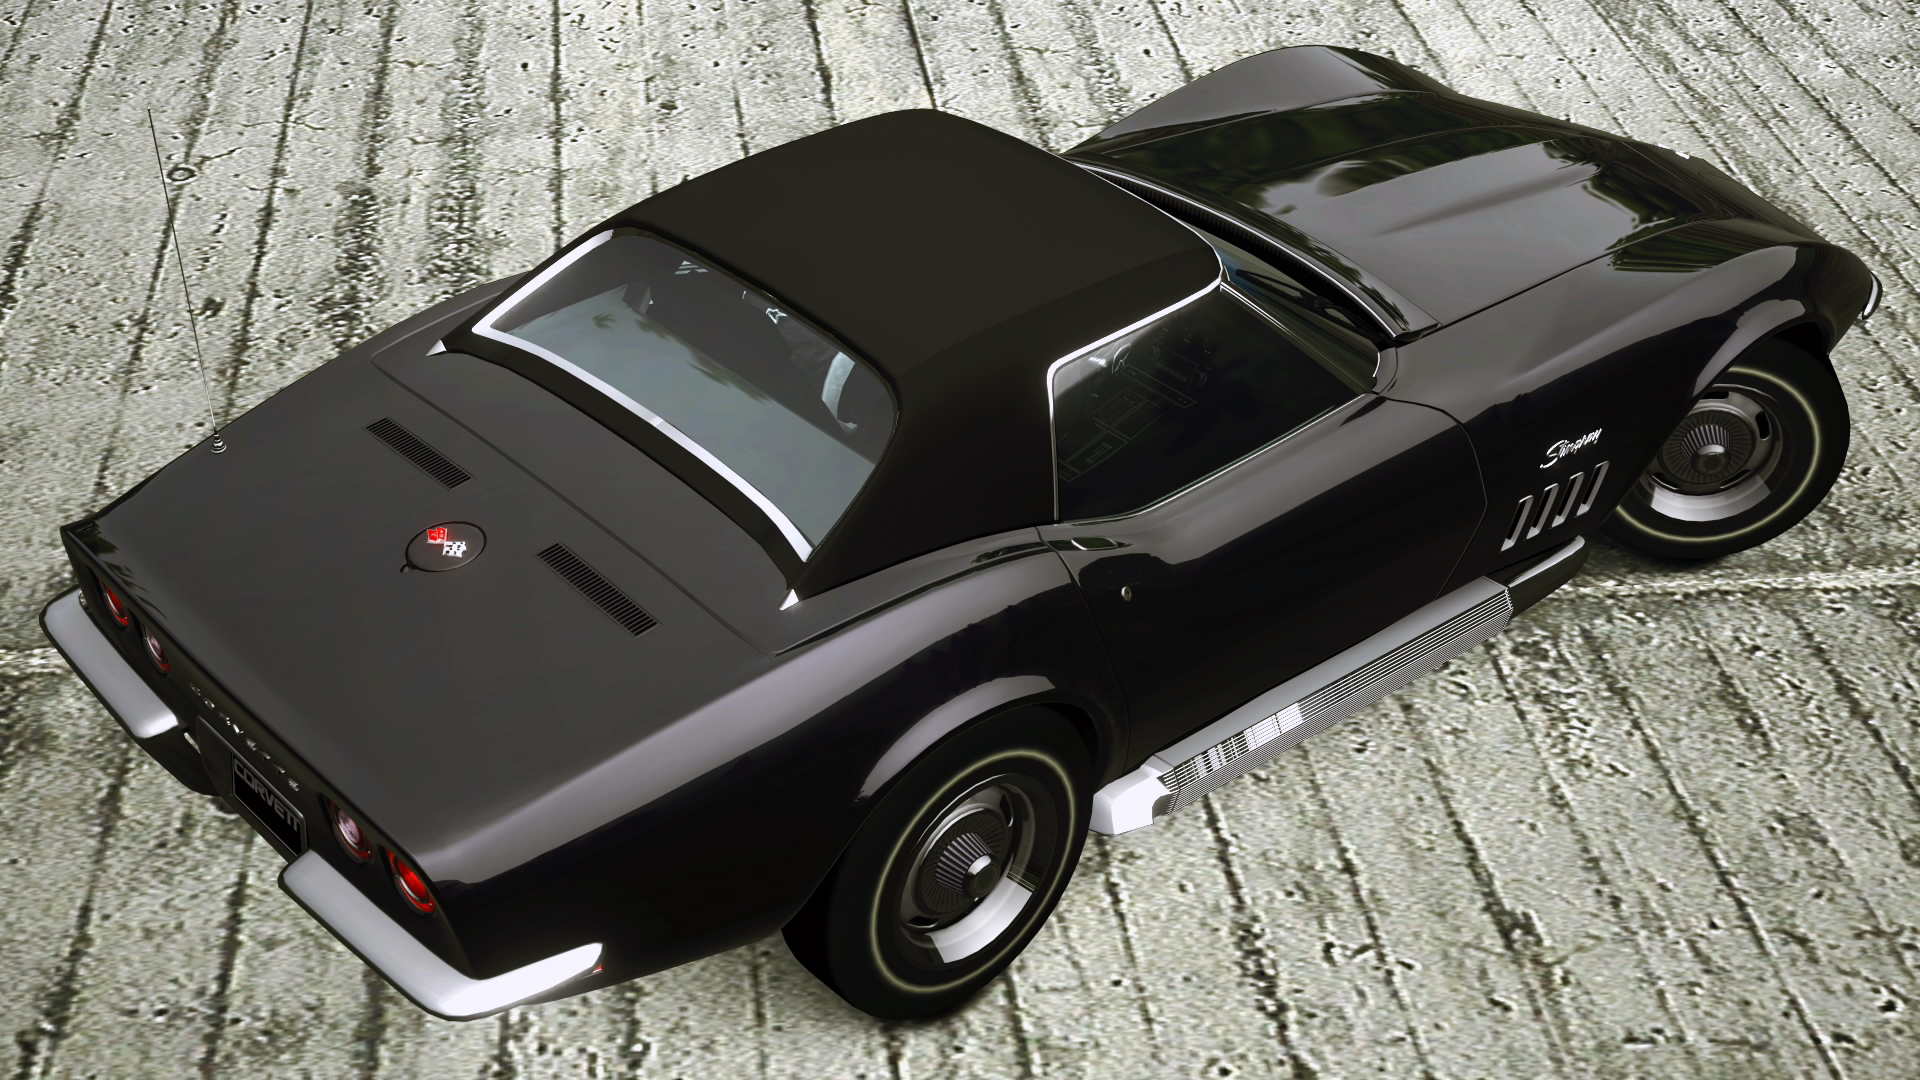 1969 chevrolet corvette stingray convertible gt5 by vertualissimo - Corvette Stingray 1969 Wallpaper